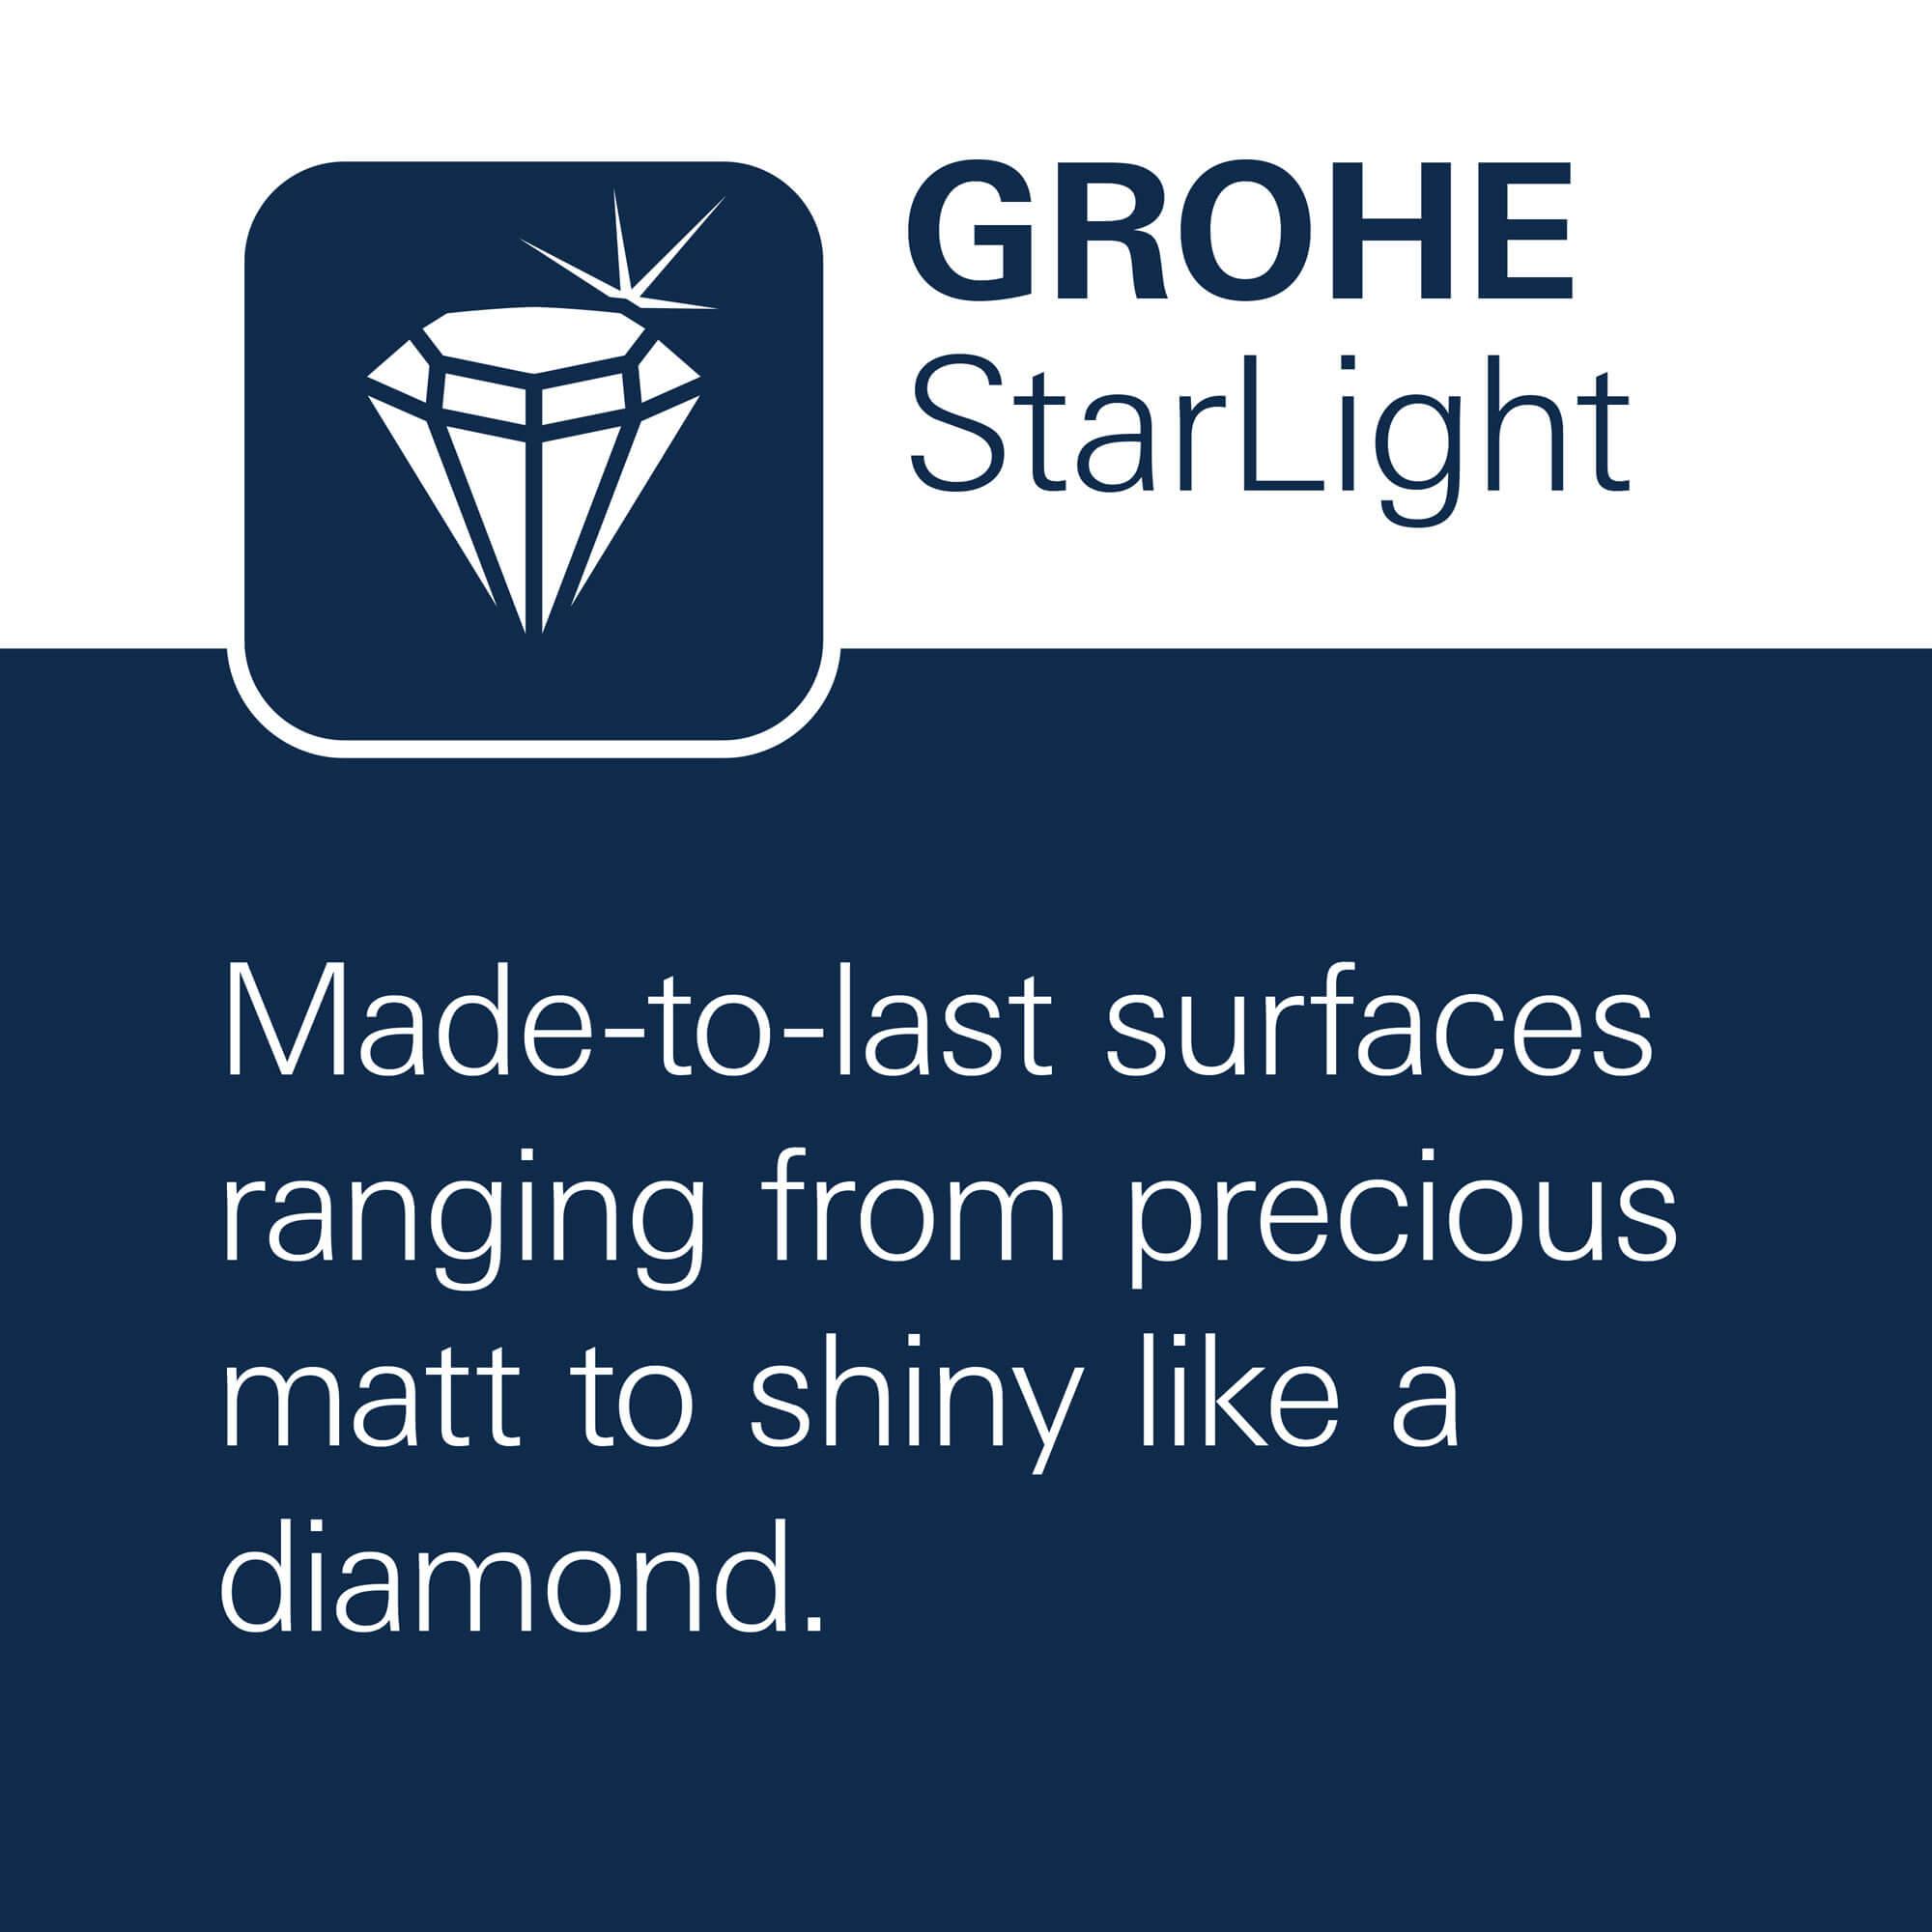 GROHE StarLight - Made-to-last surfaces ranging from precious matt to shiny like a diamond.